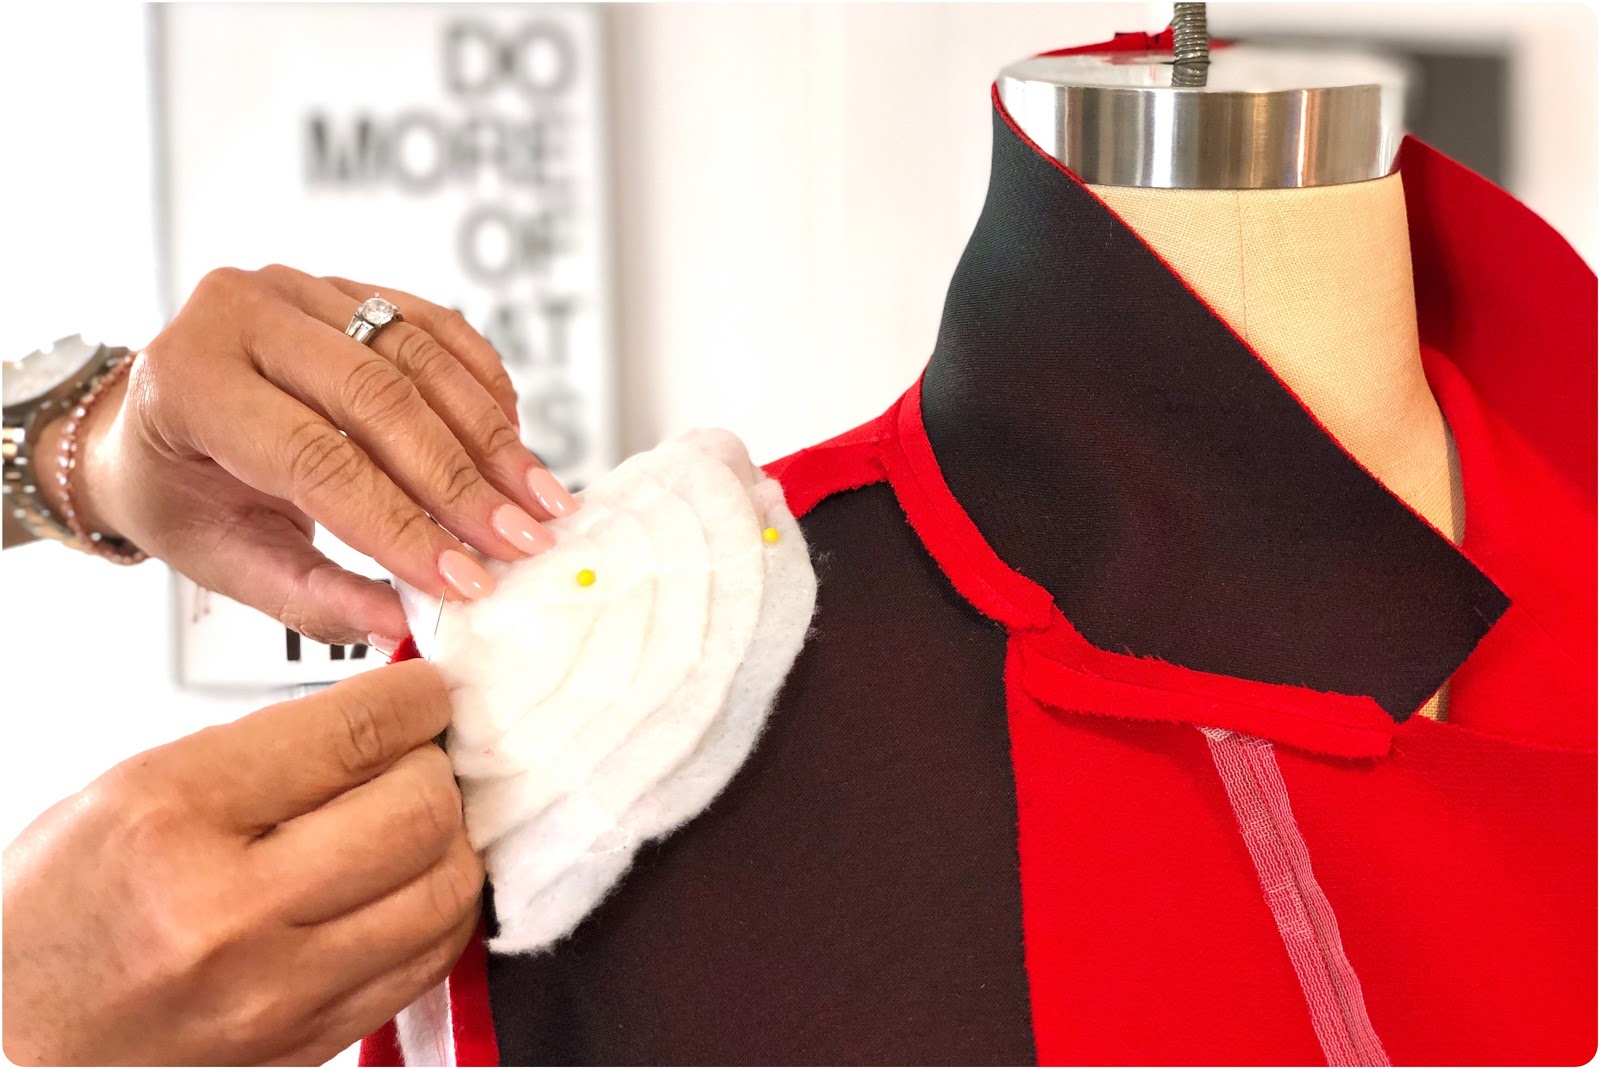 Custom Shoulder Pads Tutorial - Erica Bunker DIY Style!